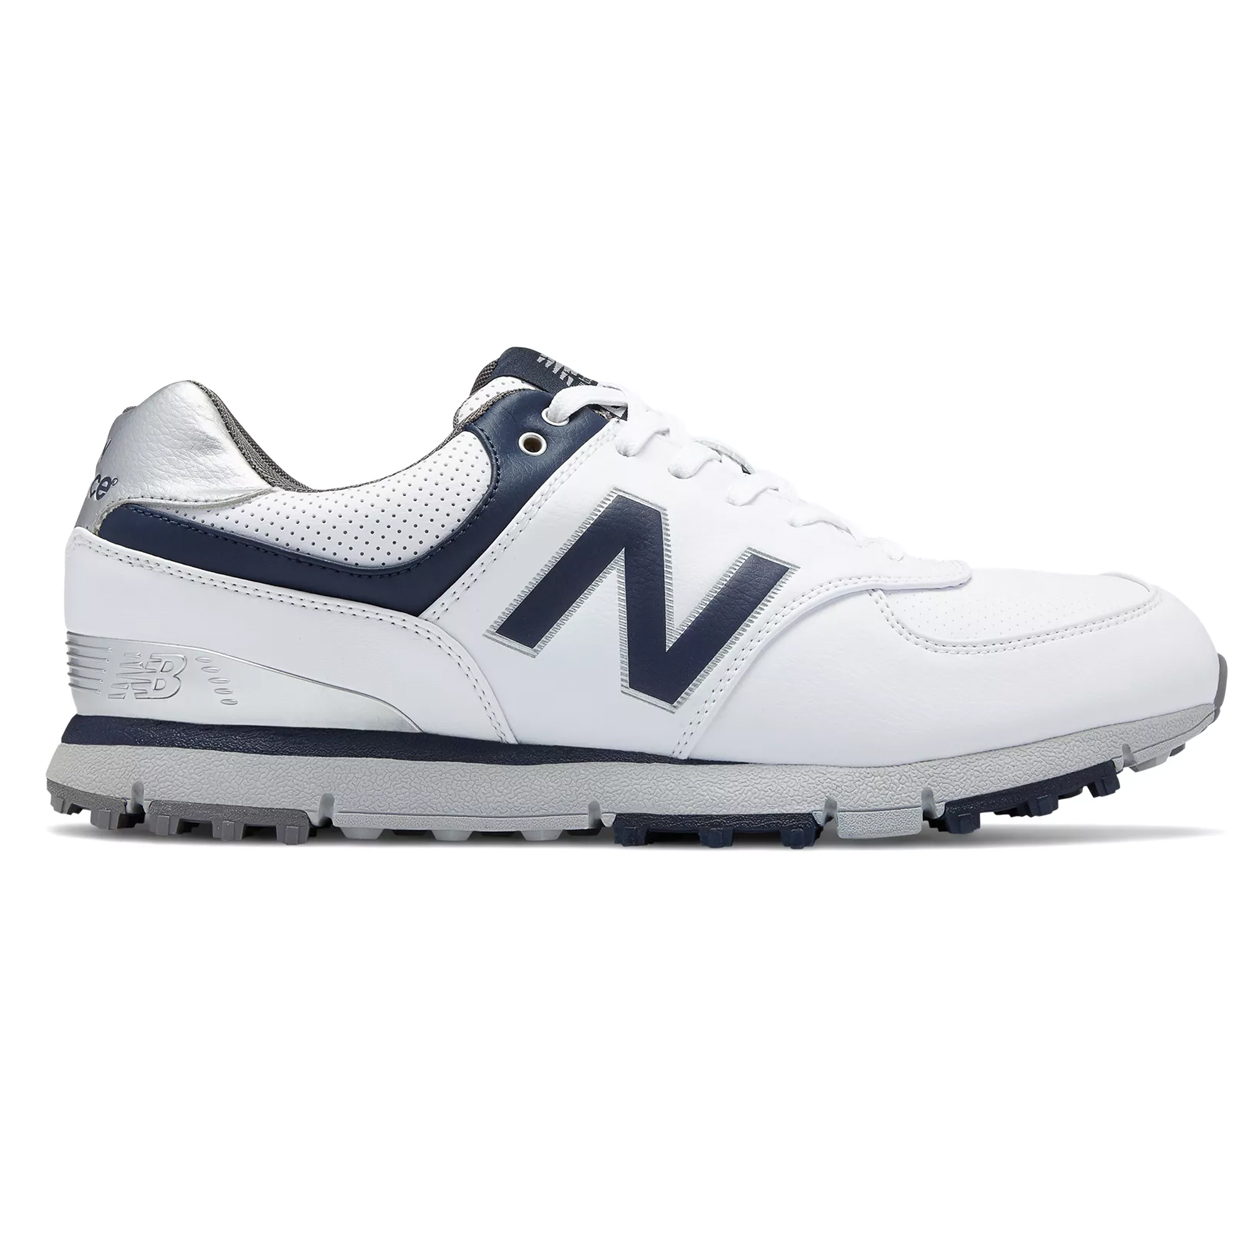 New-Balance-NBG574SL-Men-039-s-Spikeless-Microfiber-Leather-Golf-Shoe-New thumbnail 11